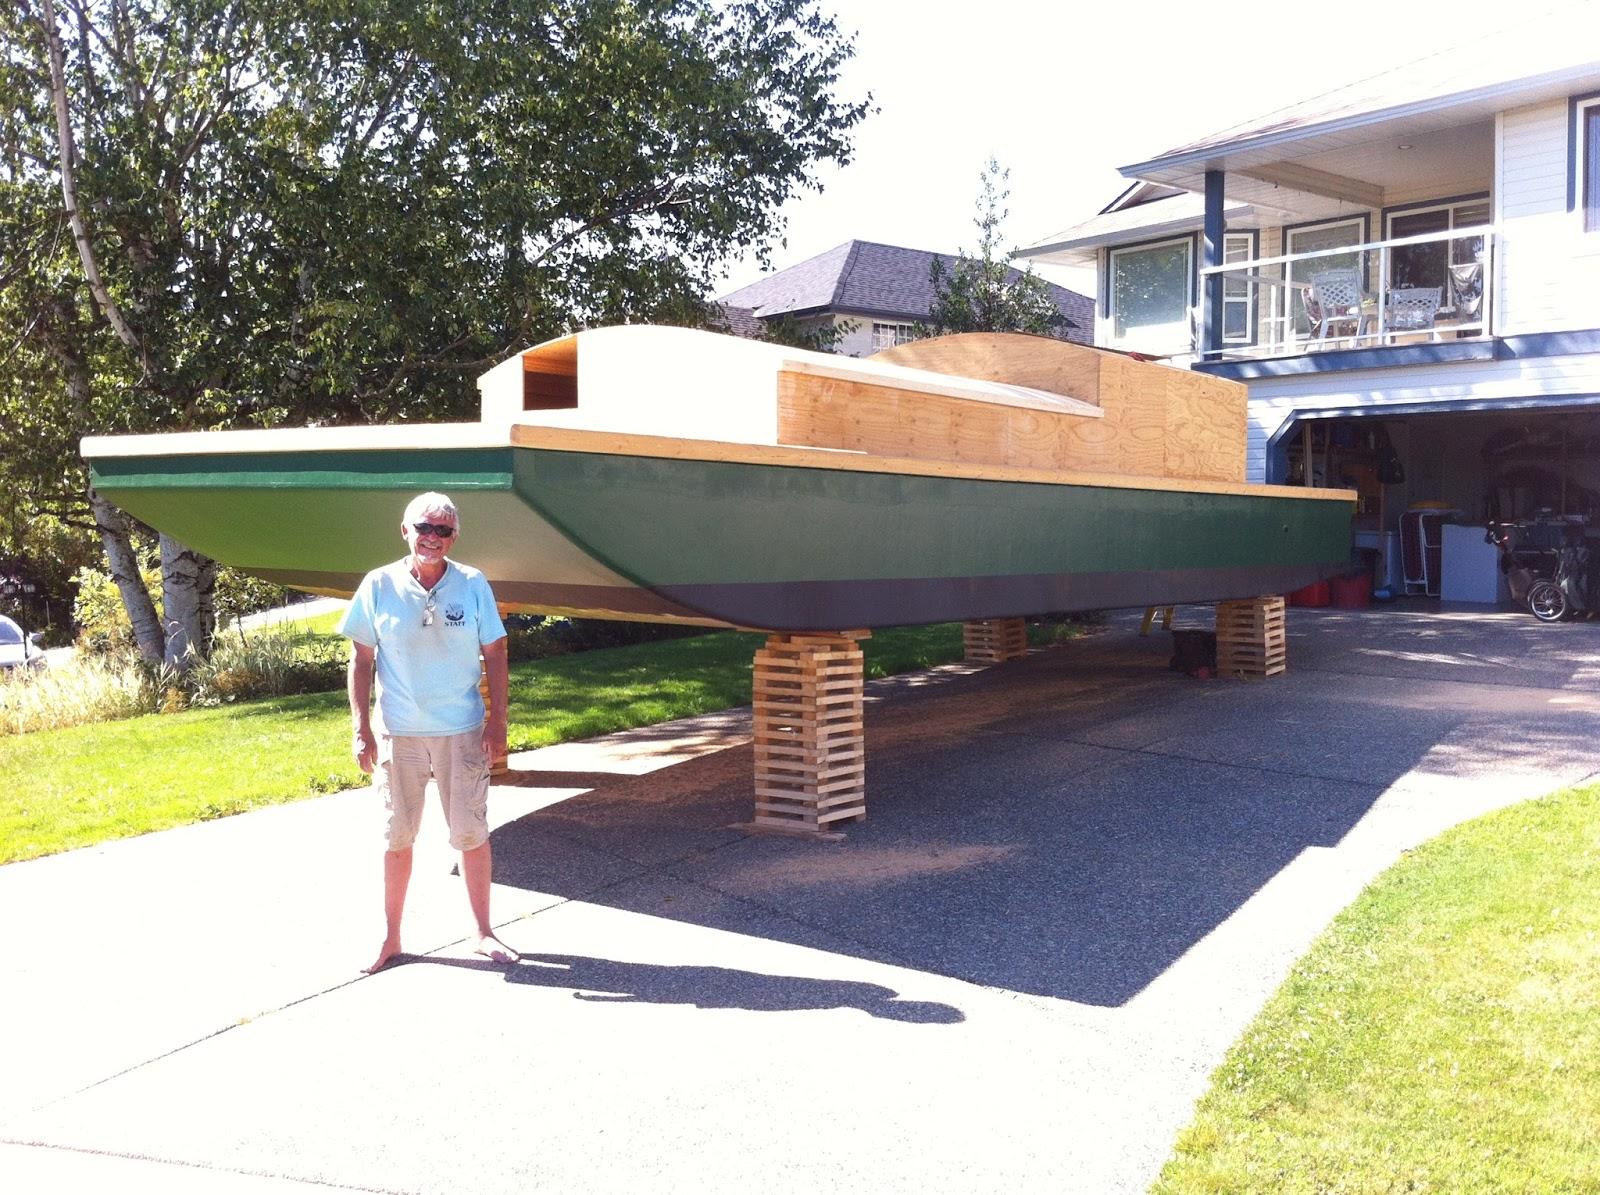 the sailing house barge autarkia july 2016